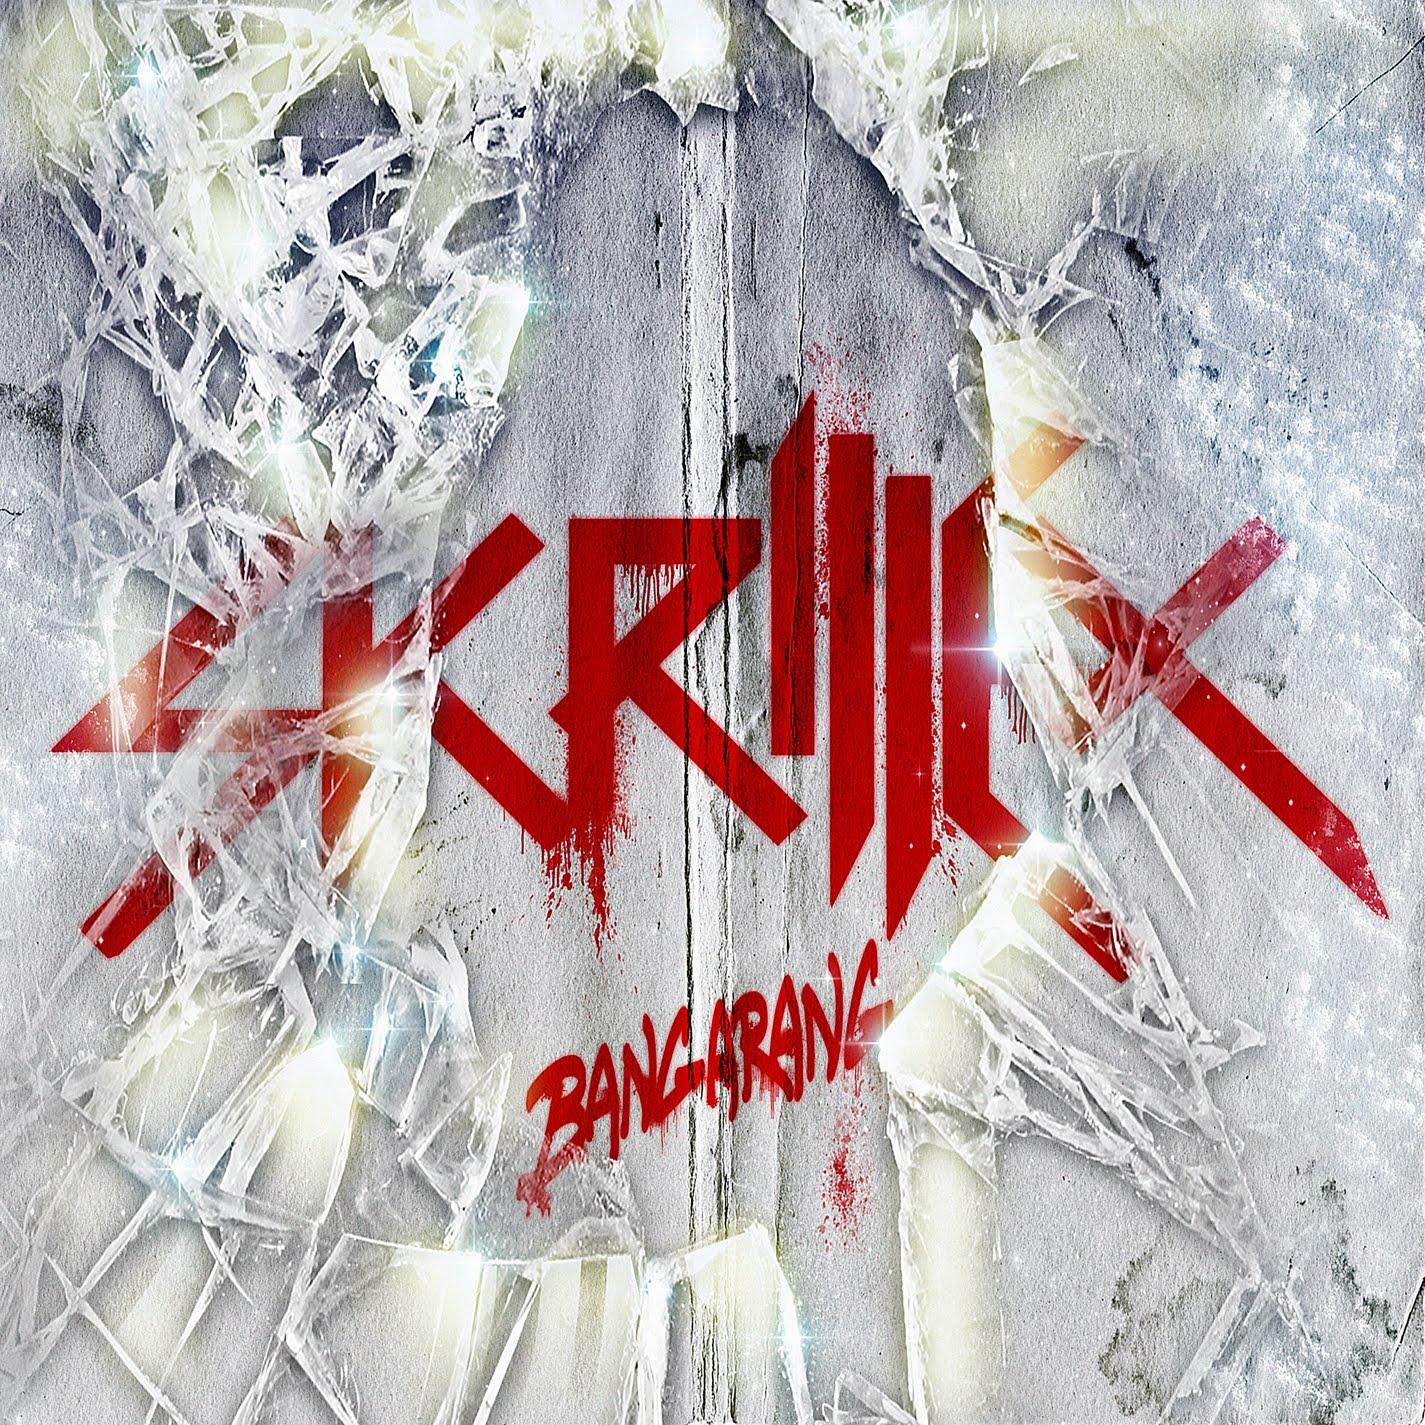 albumes de skrillex